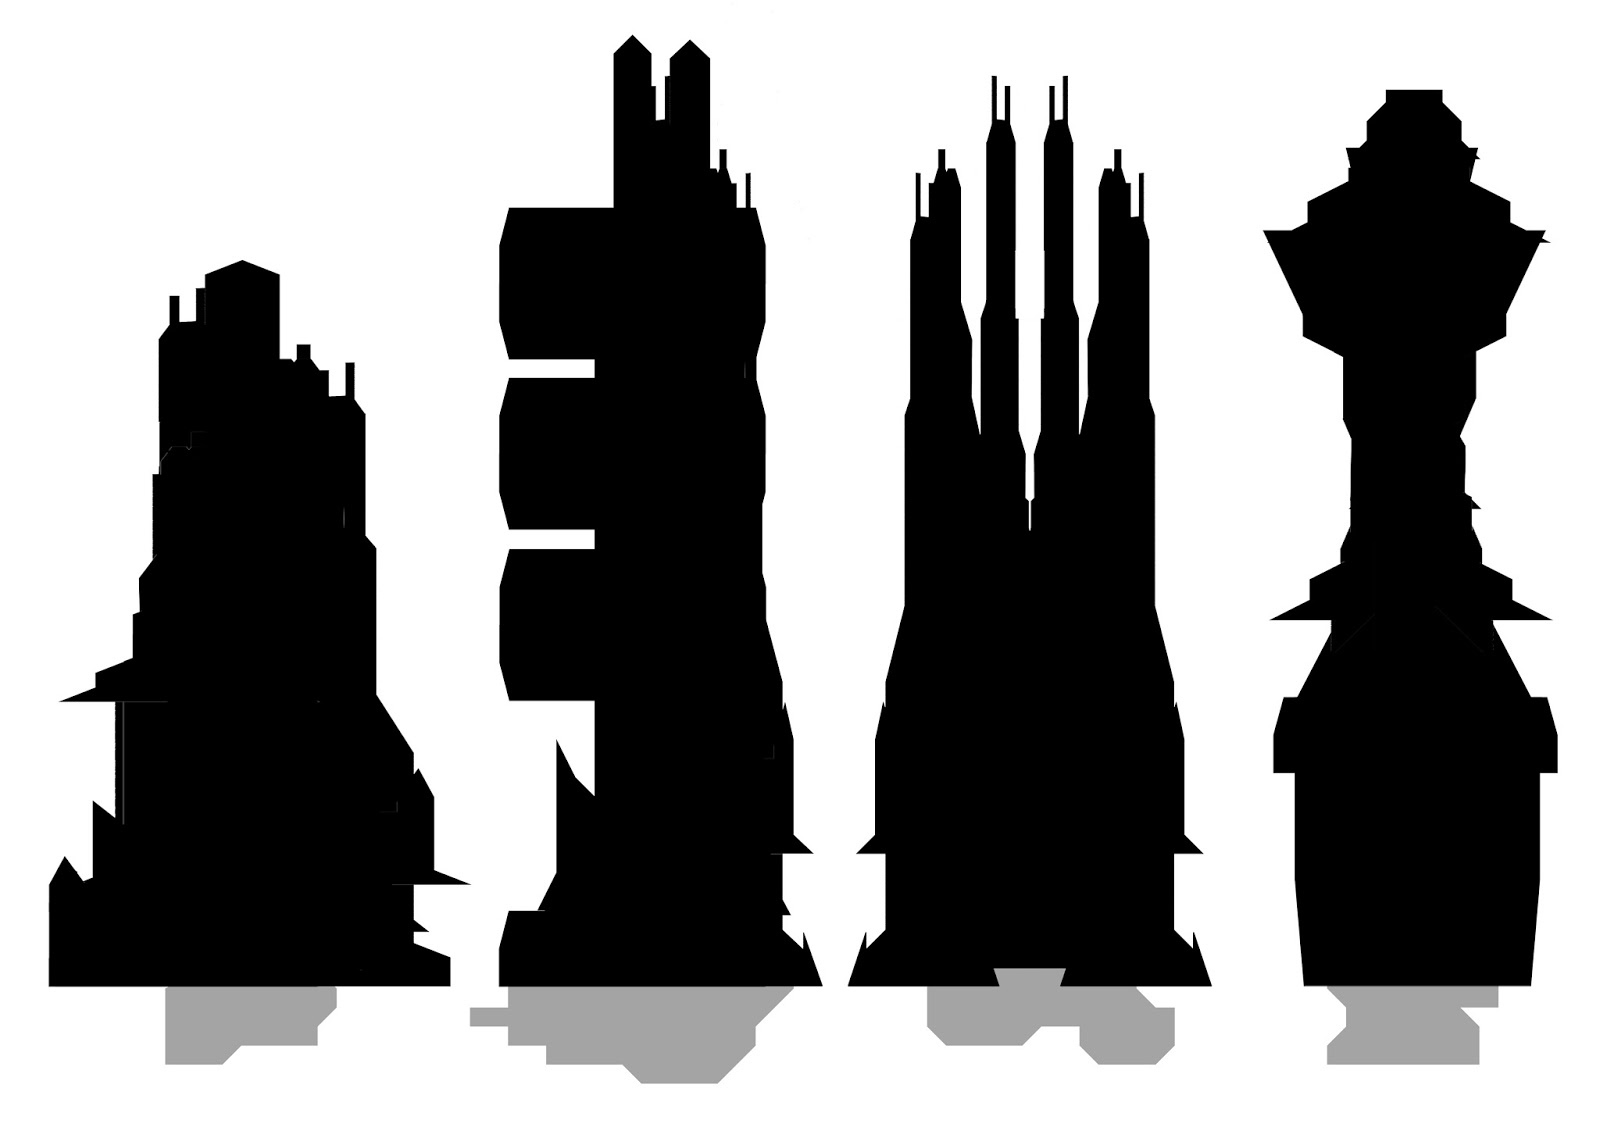 sample castles